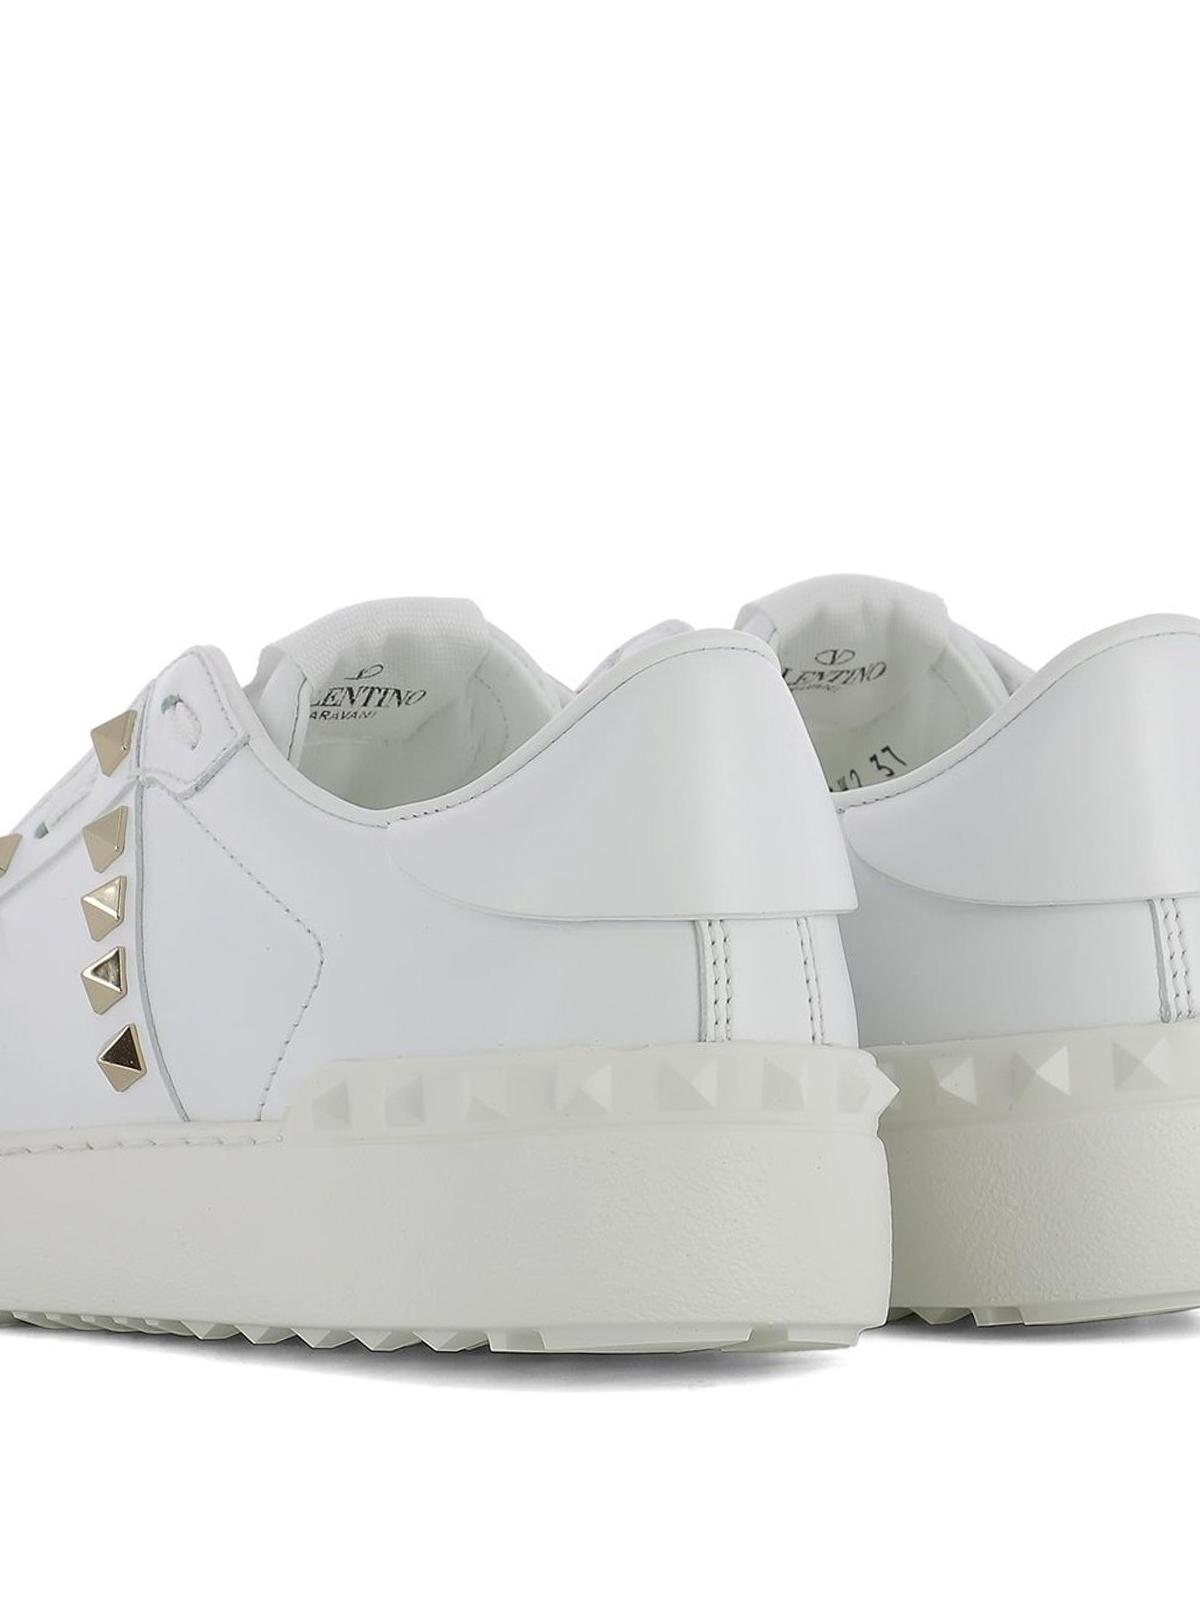 6b9ab6f79698a Valentino Garavani - Rockstud Untitled white sneakers - trainers ...